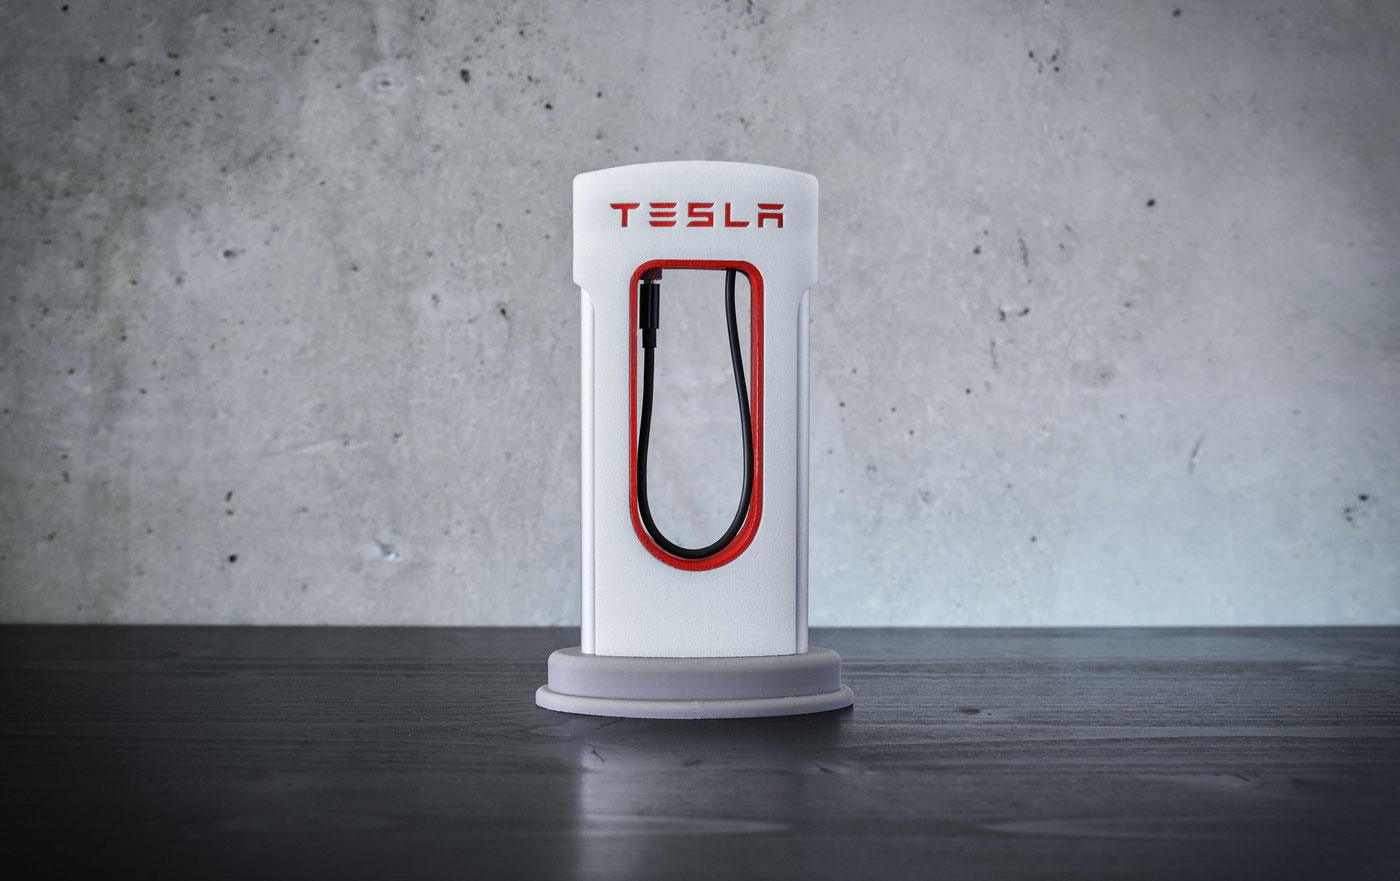 iPhone Tesla Supercharger